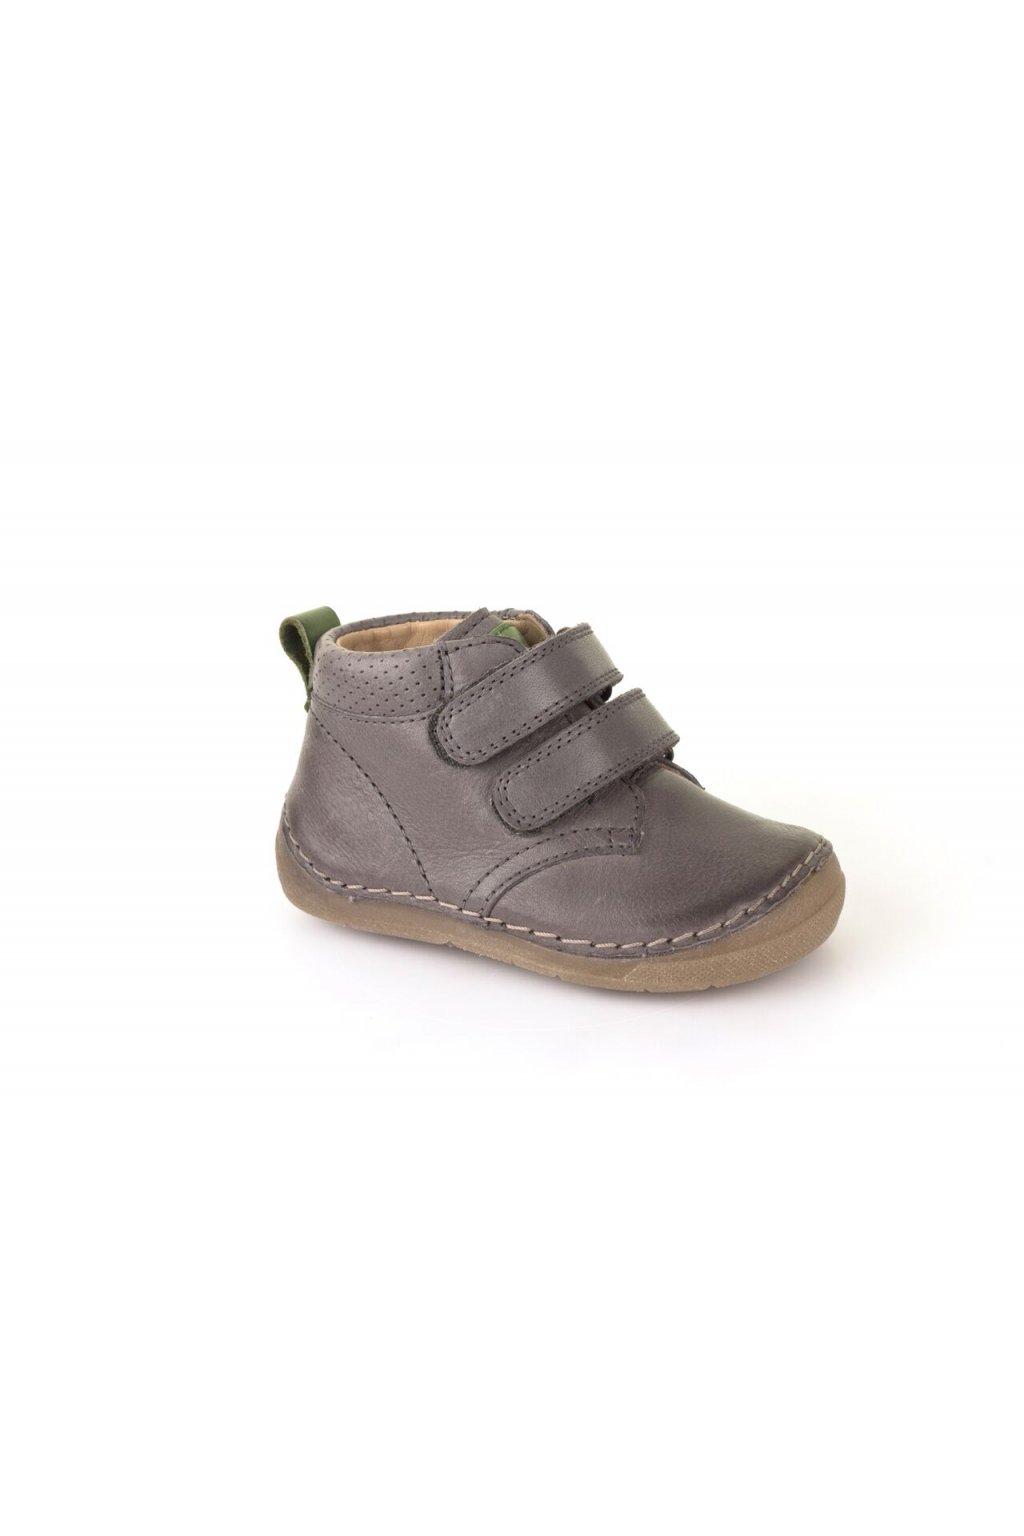 Froddo Shoes Grey